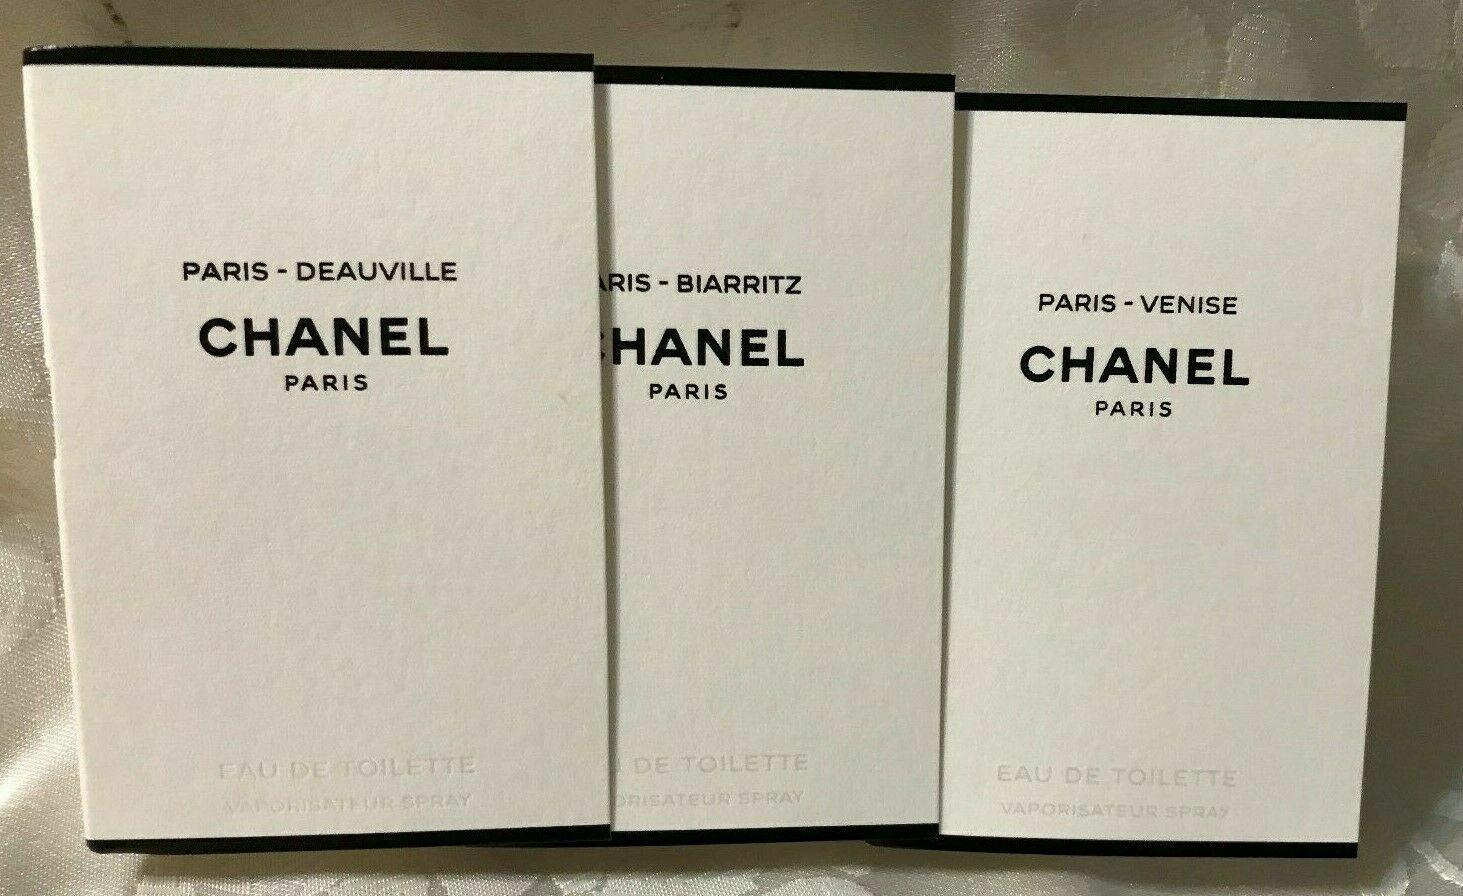 Chanel Various 15ml Perfume sample chance eau tendre fracihe no 5 coco